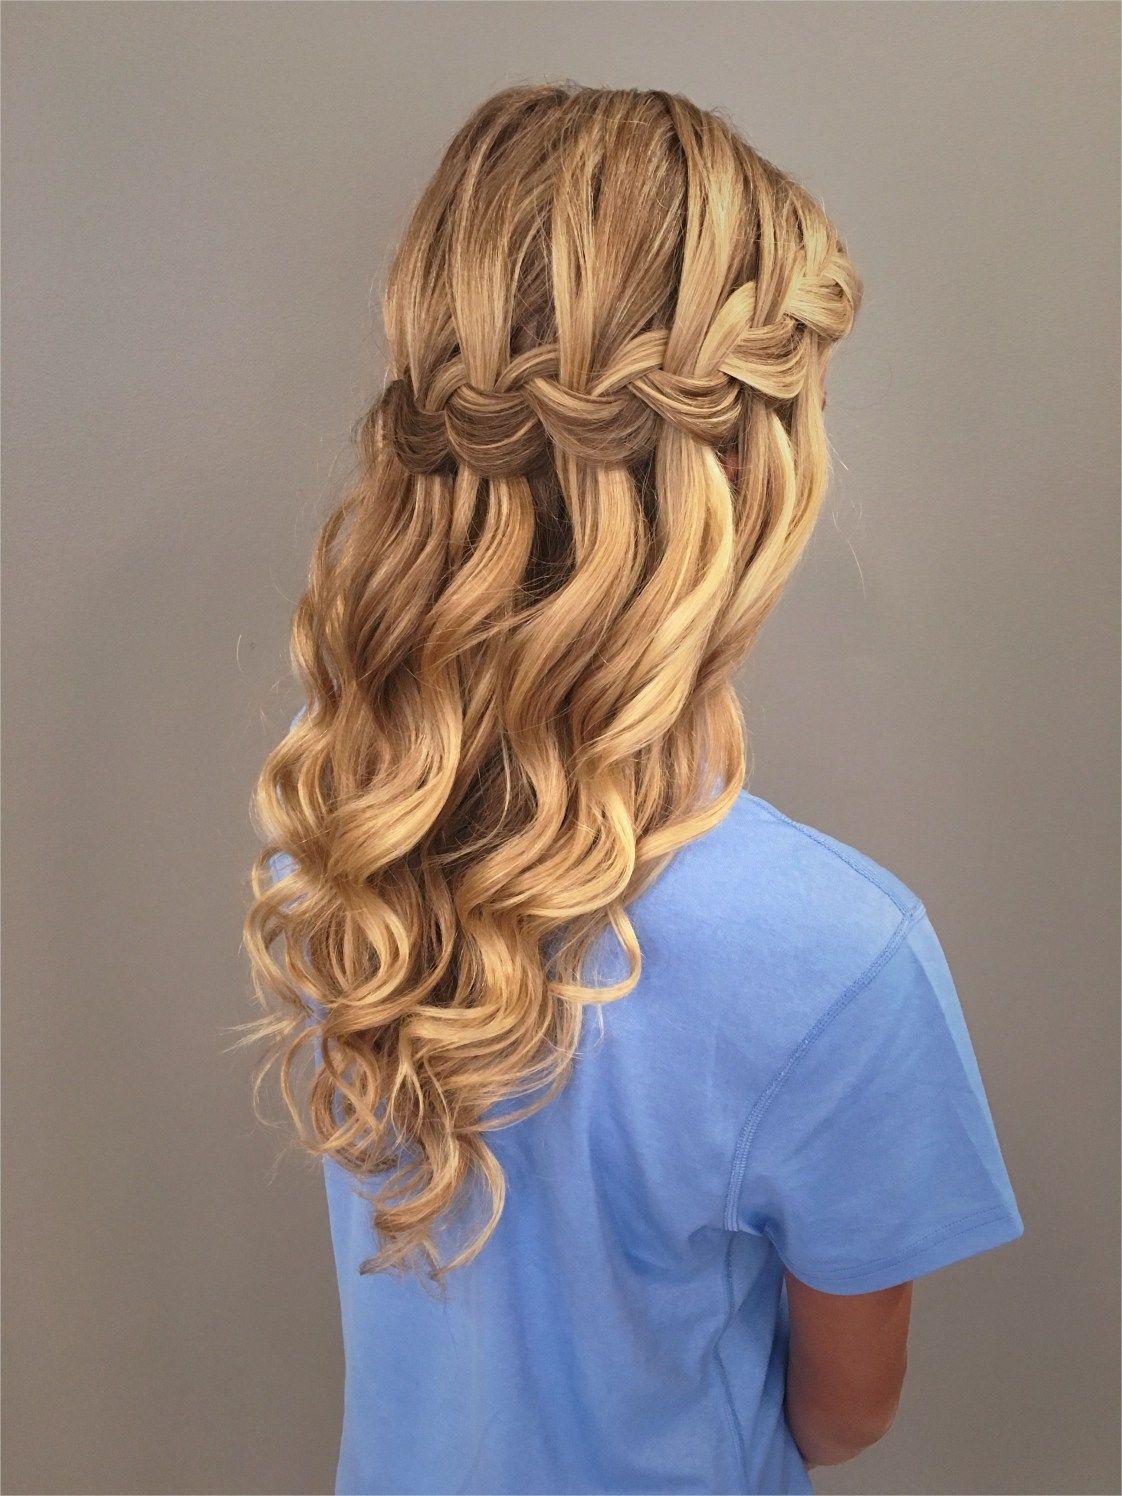 44 Beautiful Waterfall Braid Hairstyles For Winter Ball 22 Waterfall